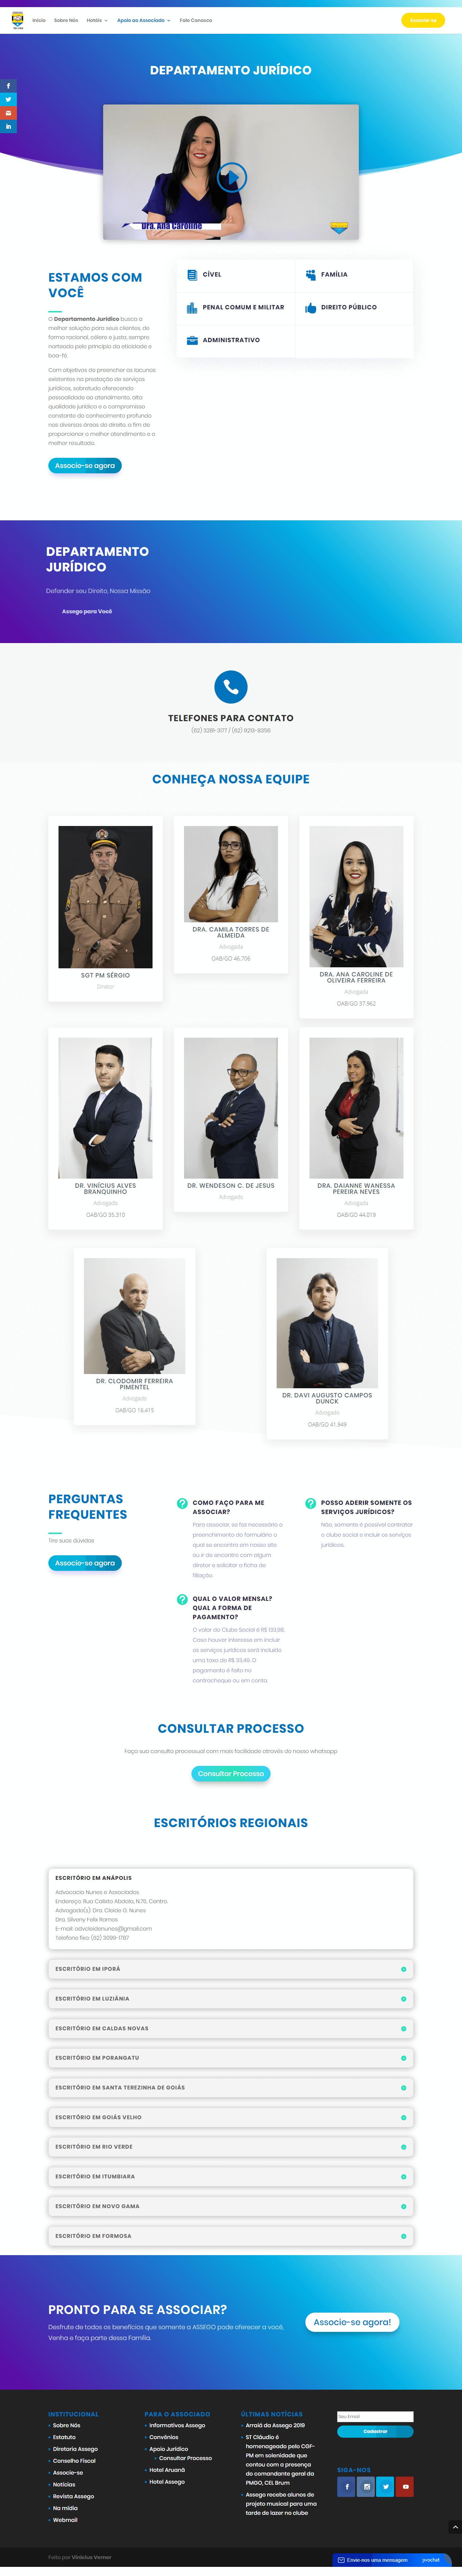 assego.com.br - Vinicius Verner